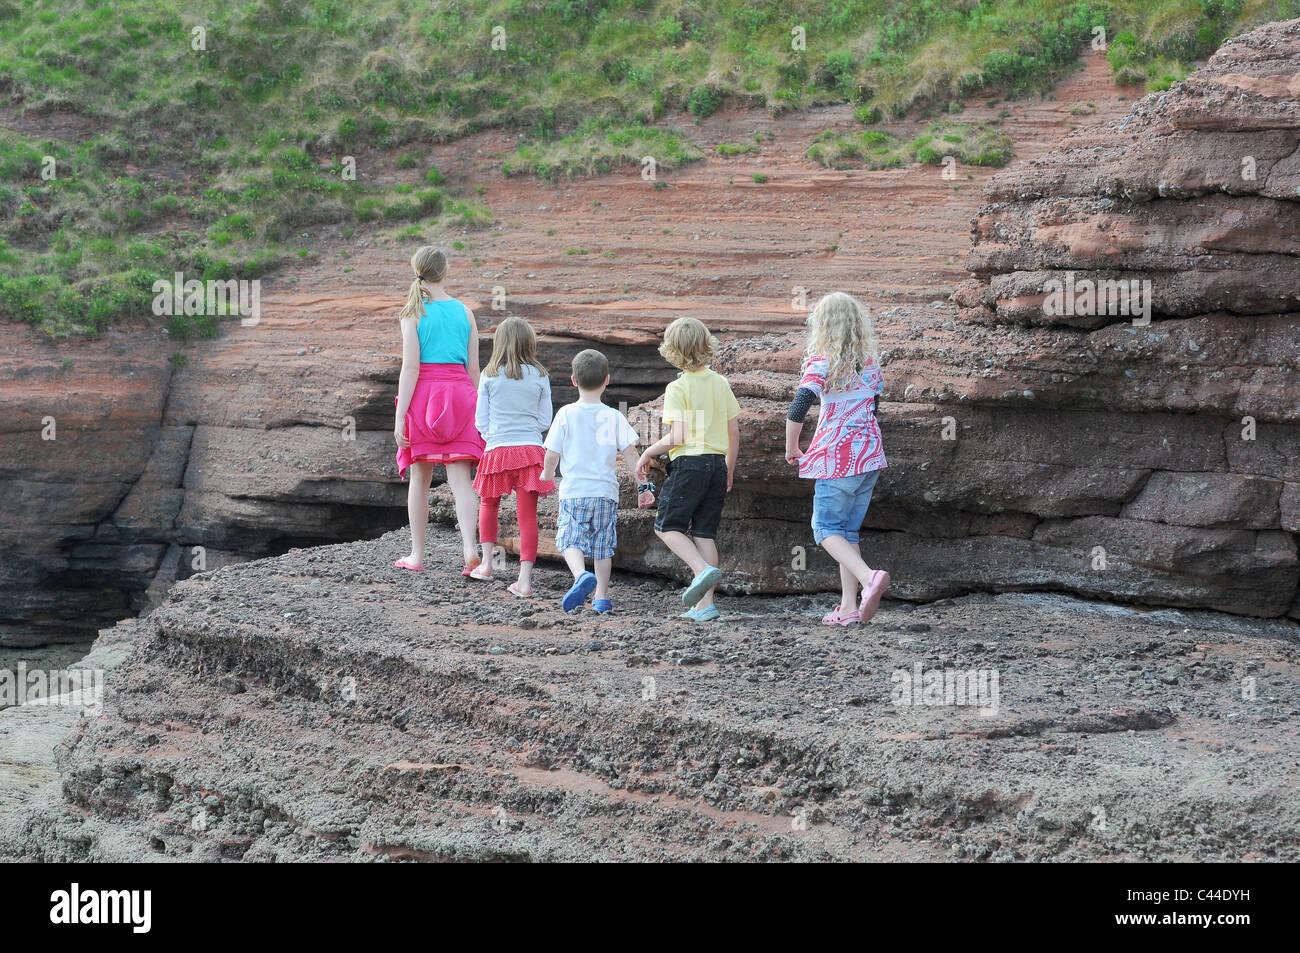 Famous Five Children explore rocks showing coastal erosion in pied piper style,South Devon on the English Riviera - Stock Image